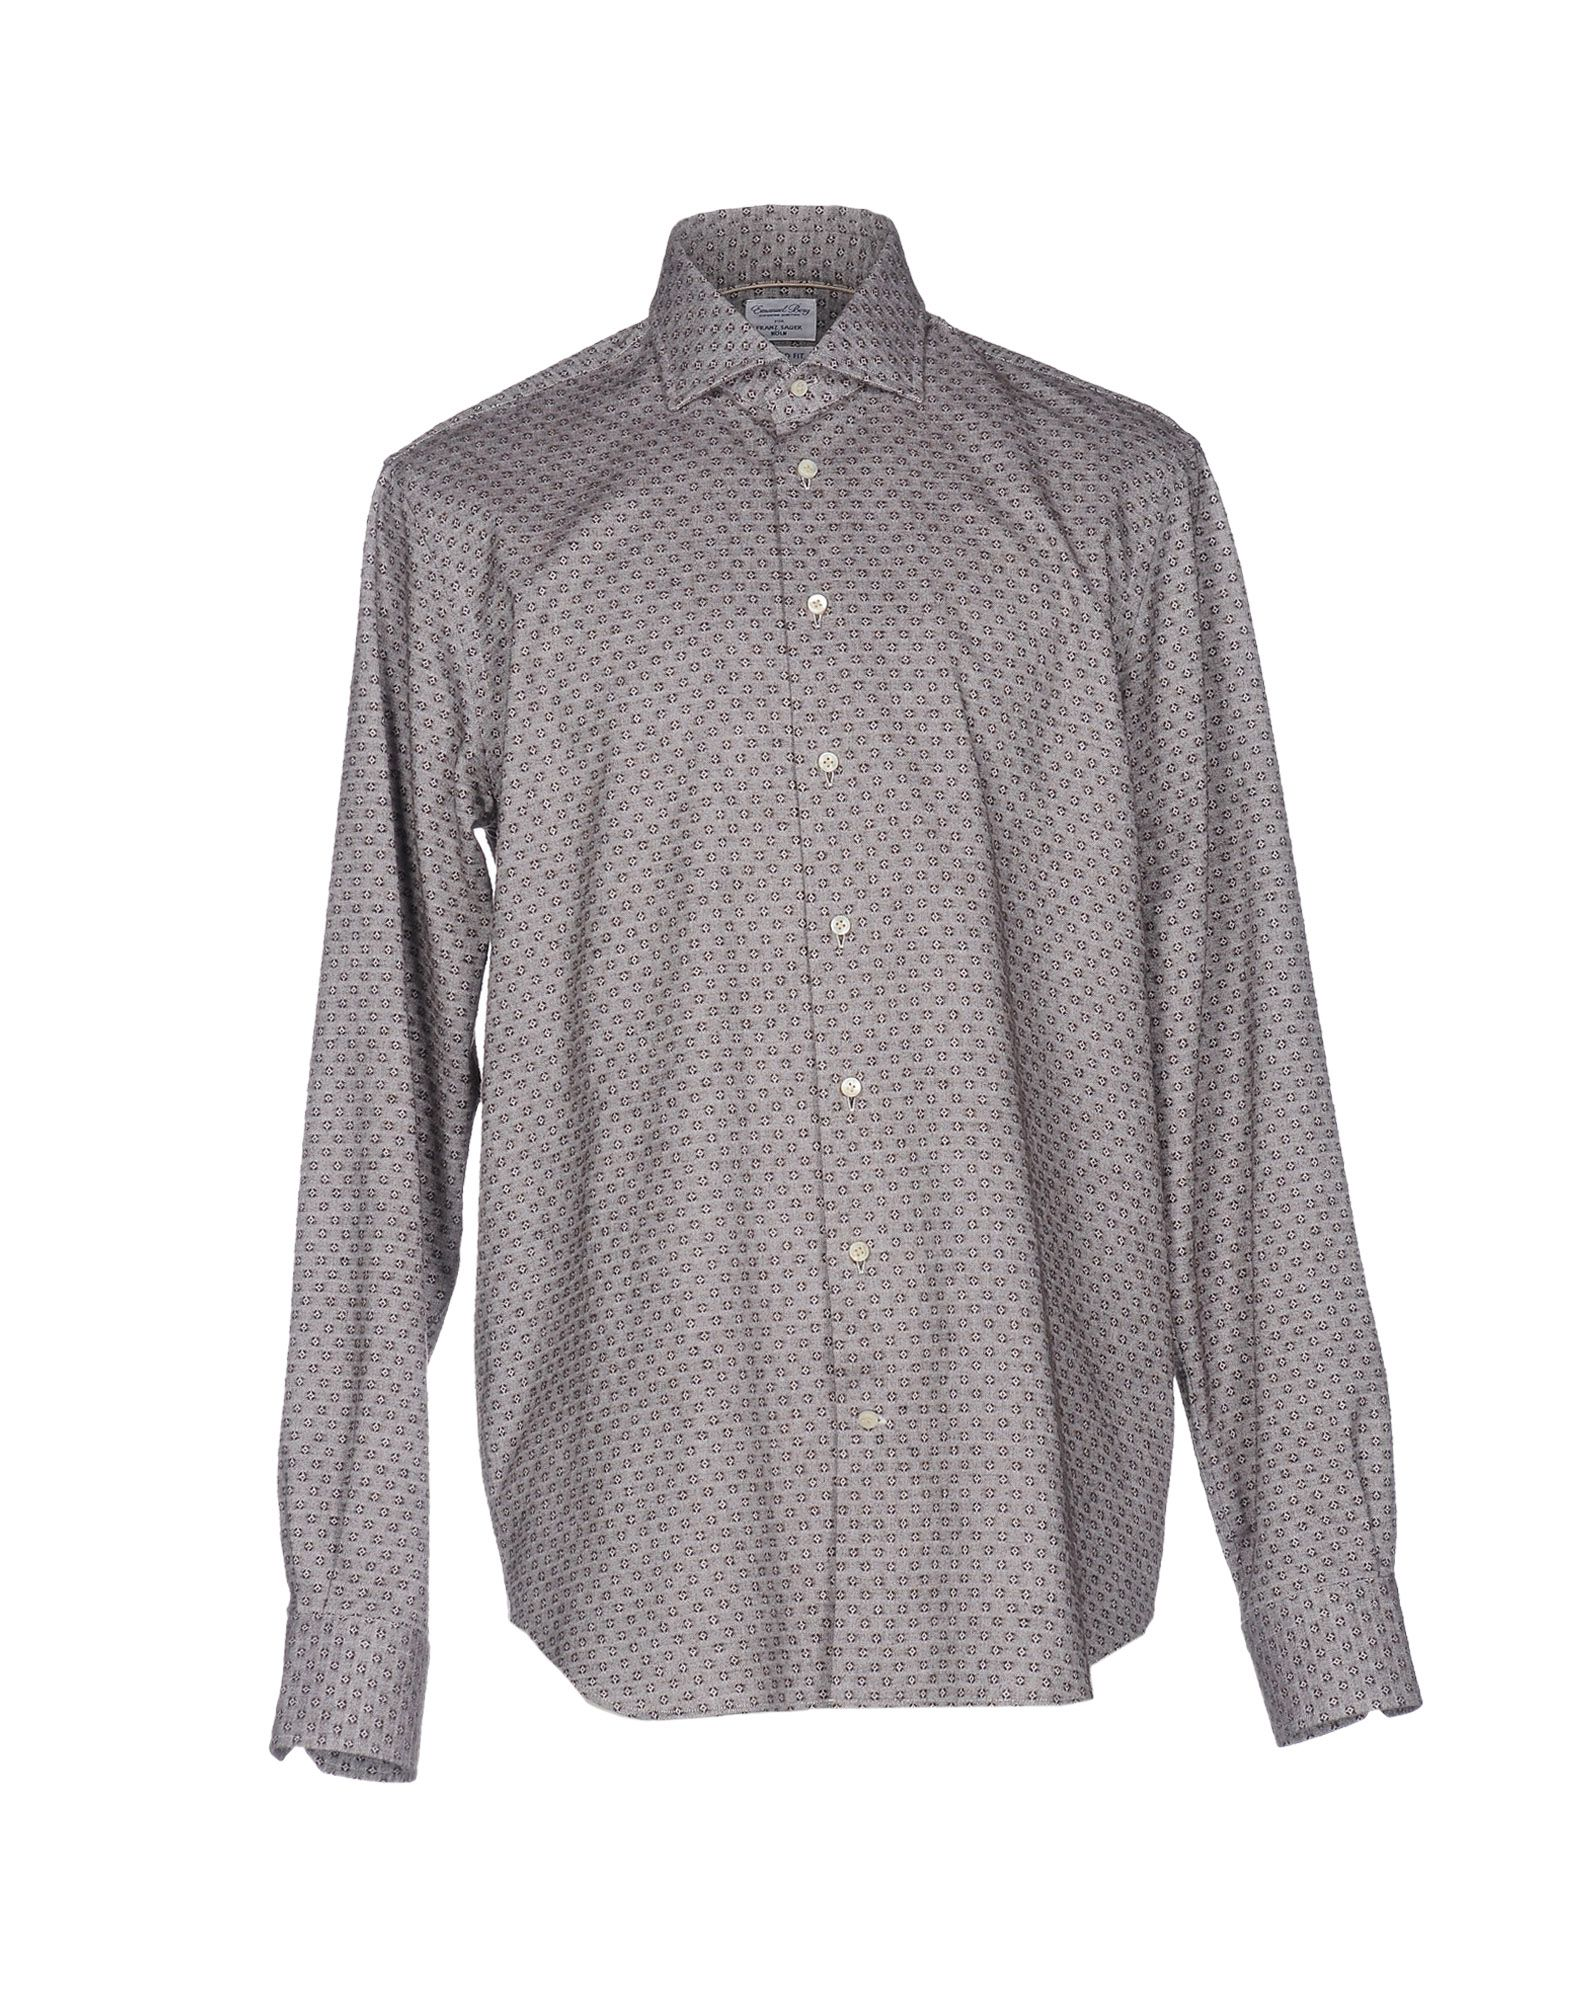 EMANUEL BERG Patterned Shirt in Grey